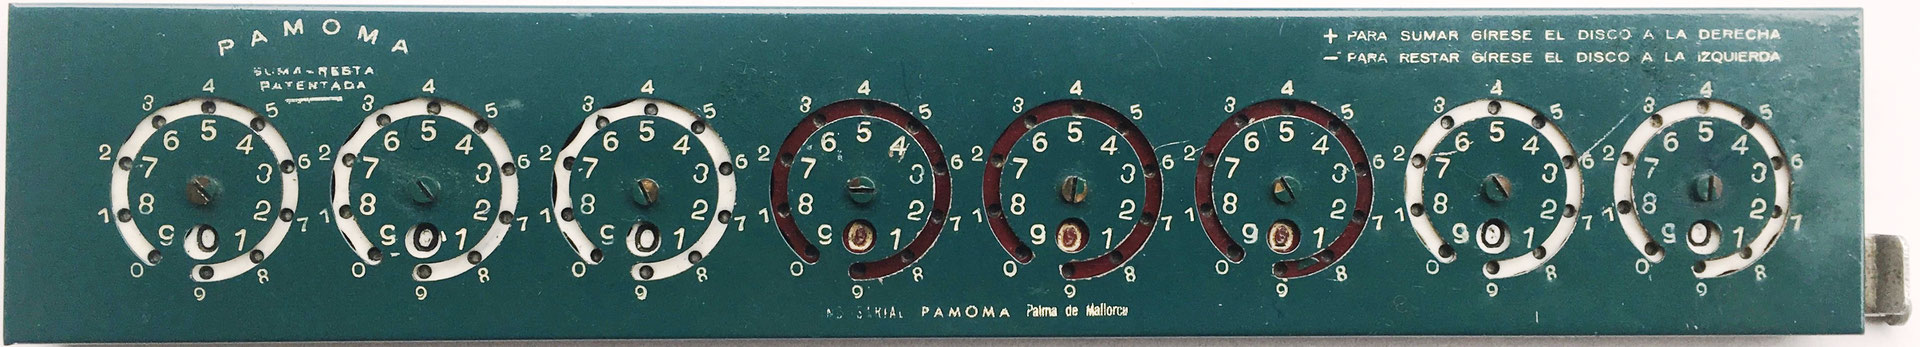 "ADDOMETER-PAMOMA modelo B ""Standar-decimal"", s/n 0022, Palma de Mallorca-ESPAÑA, hacia 1950, 29x6 cm"